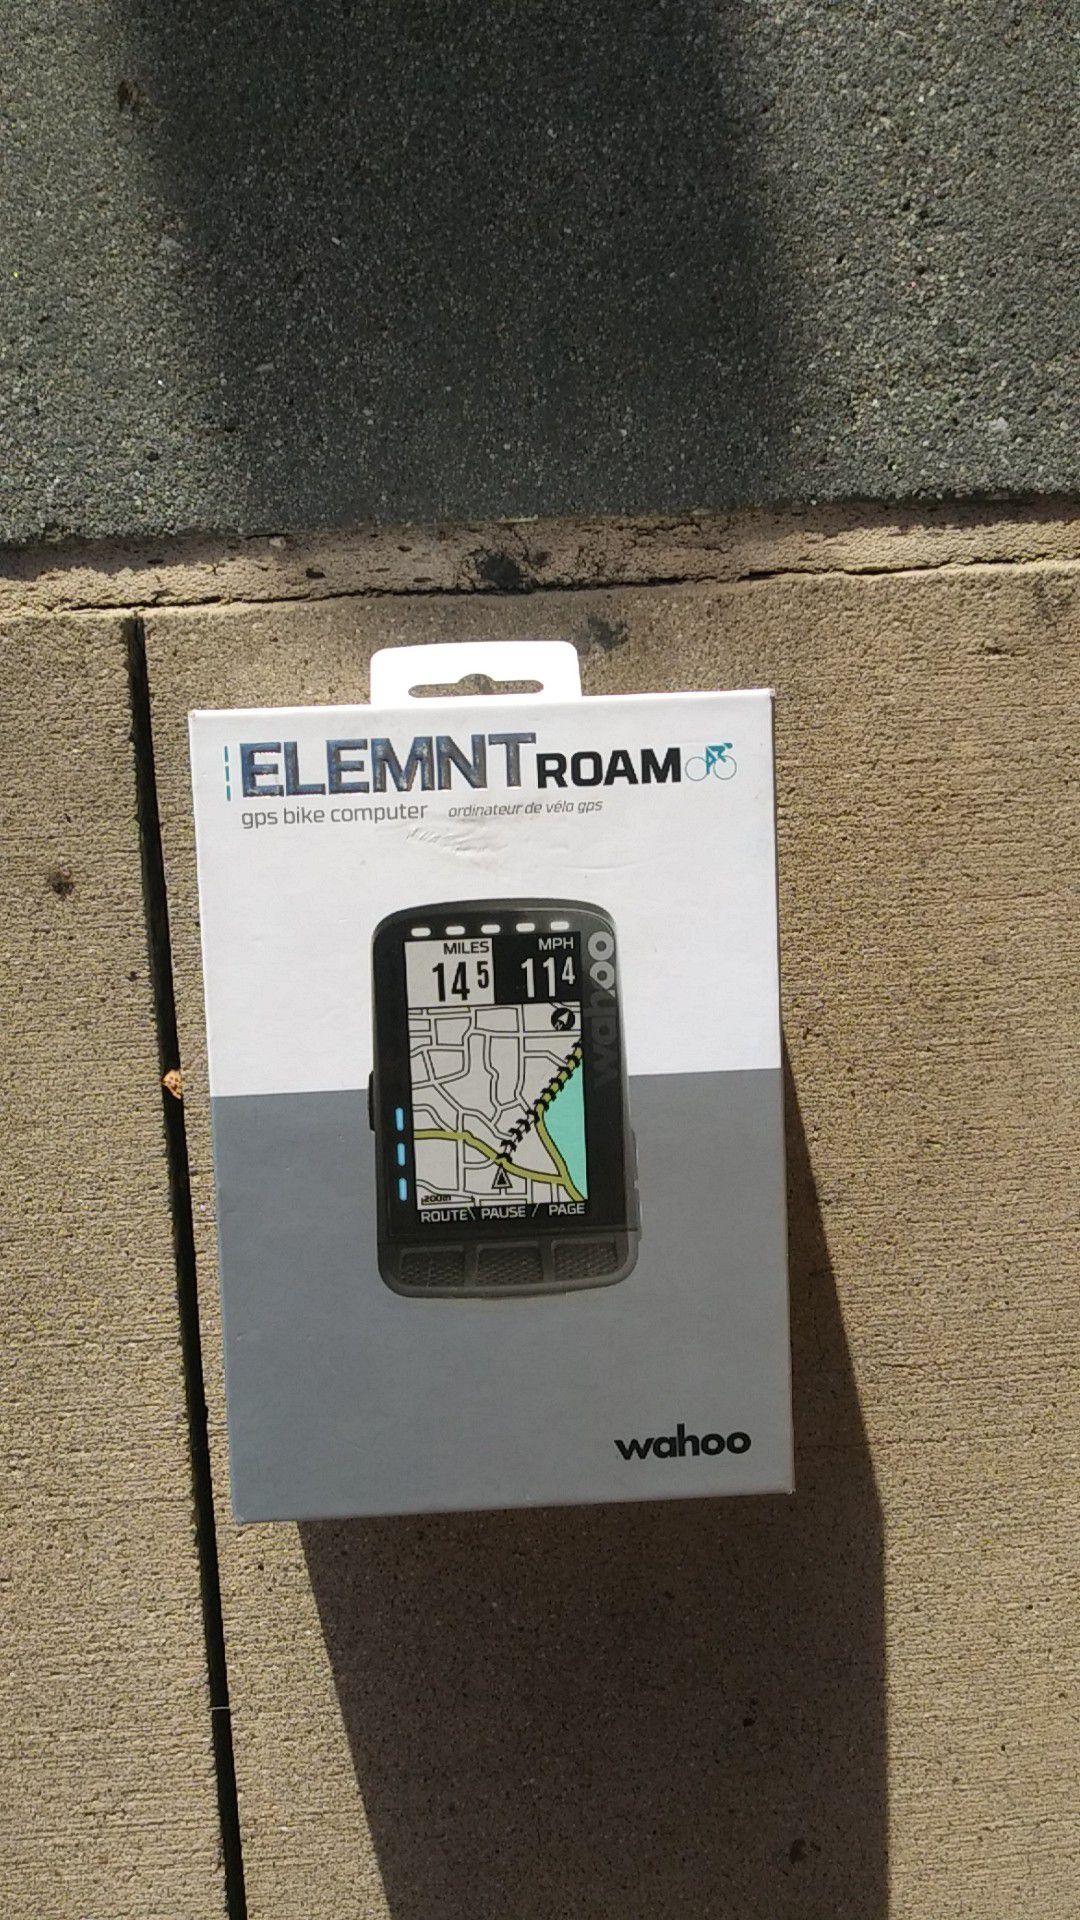 Element Roam gps bike computer